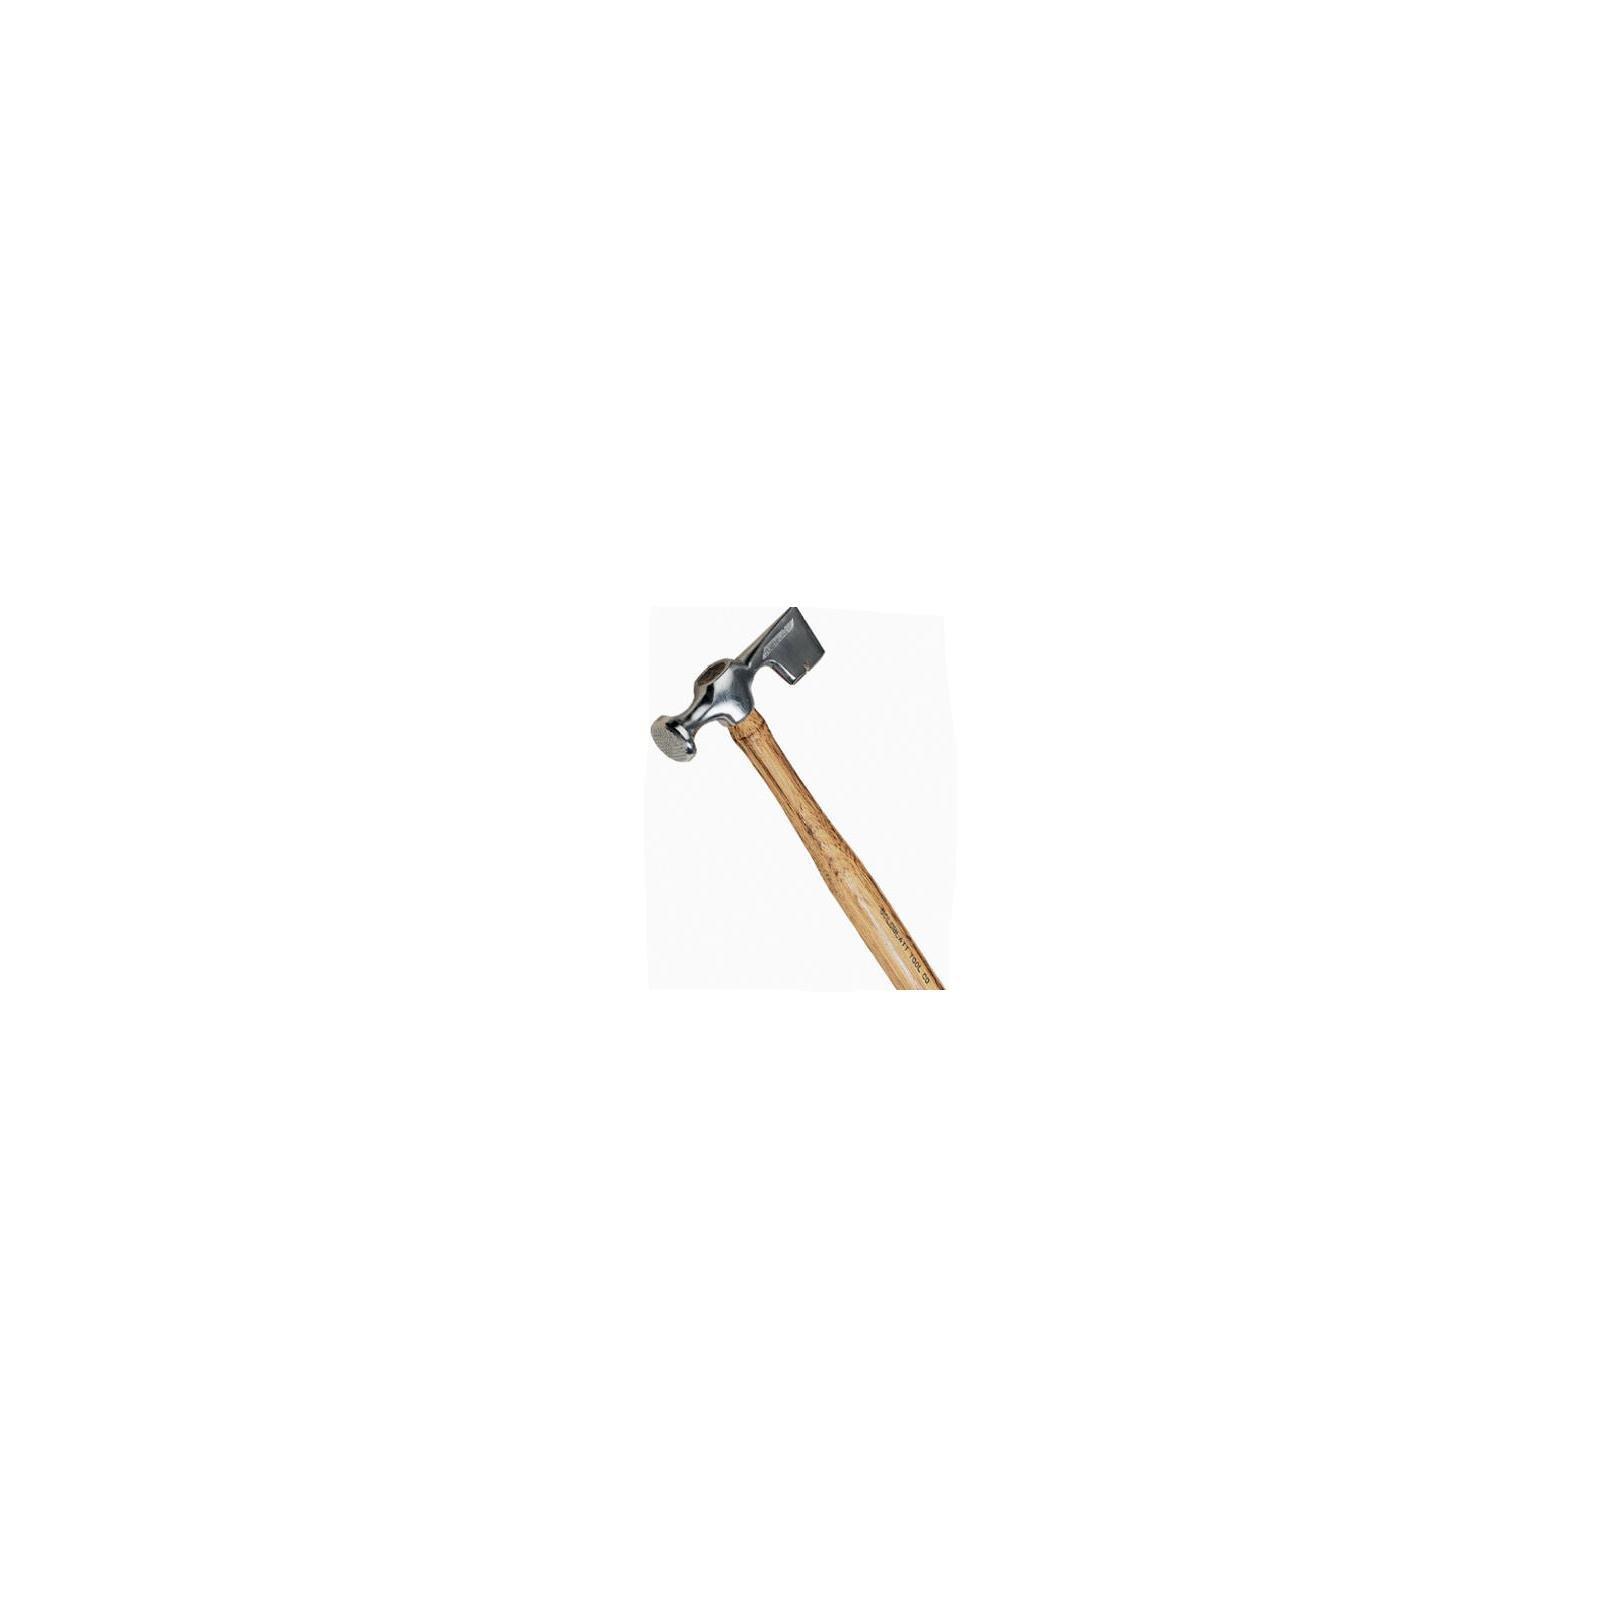 Goldblatt Industries G05164 Drywall Hammer, 12-oz. - Quantity 4